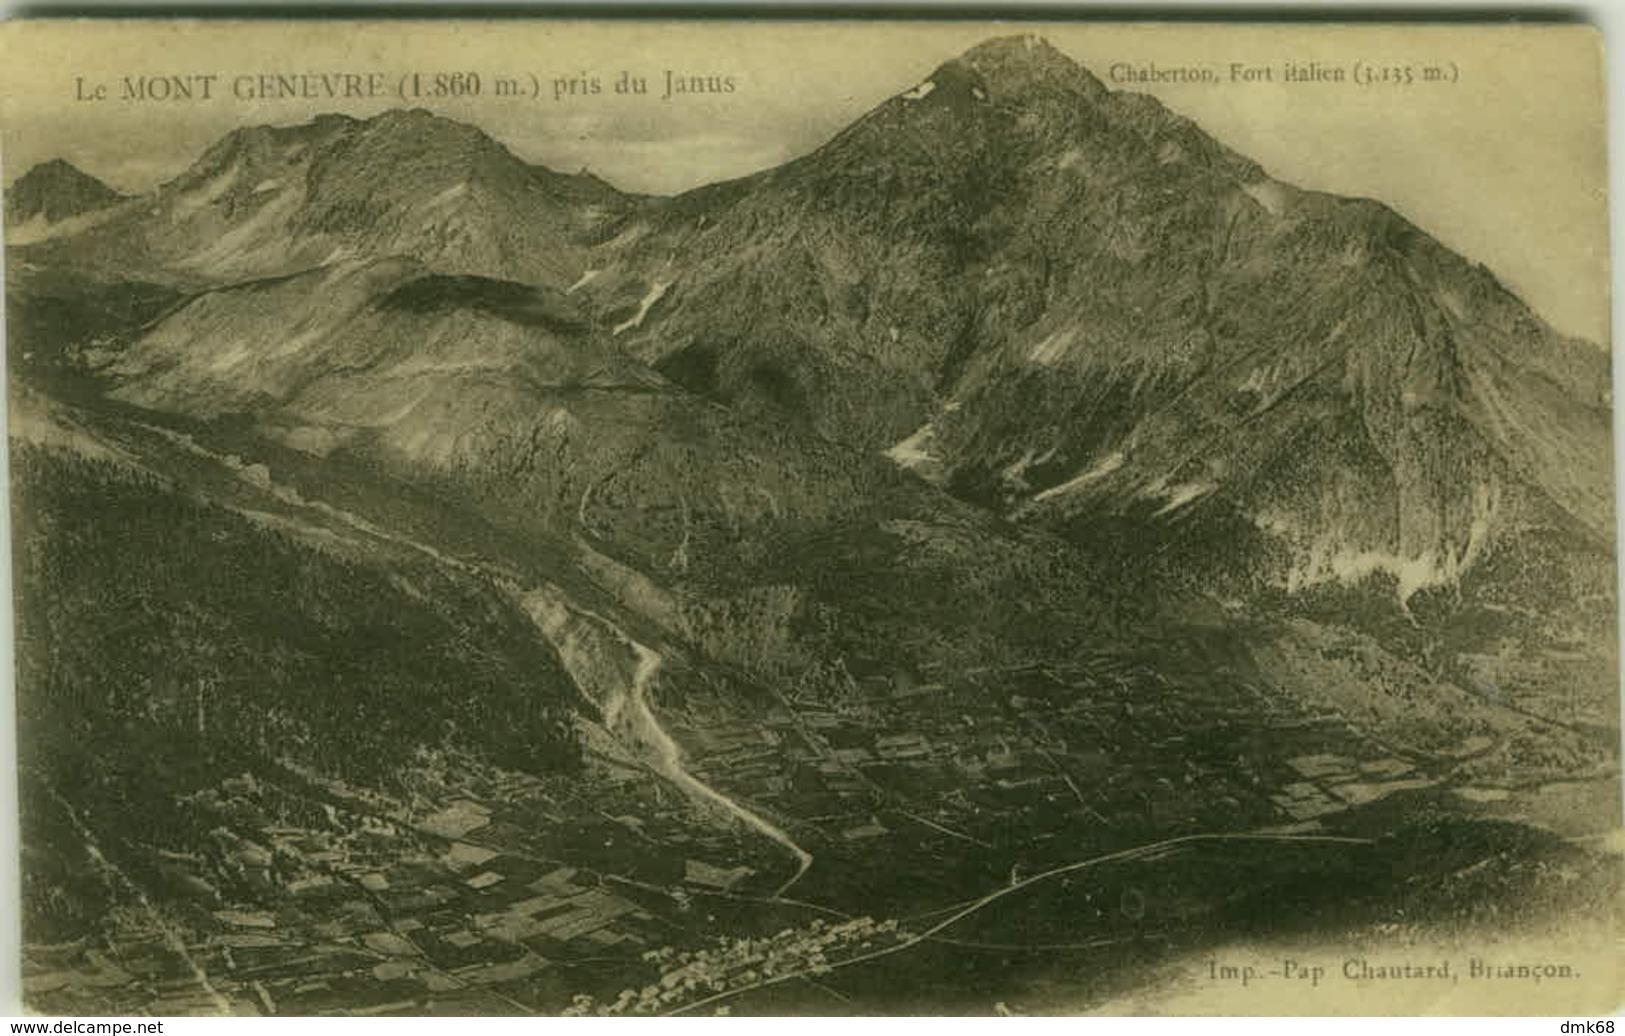 SWITZERLAND - LE MONT GENEVRE PRIS DU JANUS - CHABERTON FORT ITALIEN - EDIT PAP CHAUTARD - 1910s (BG4766) - GE Geneva